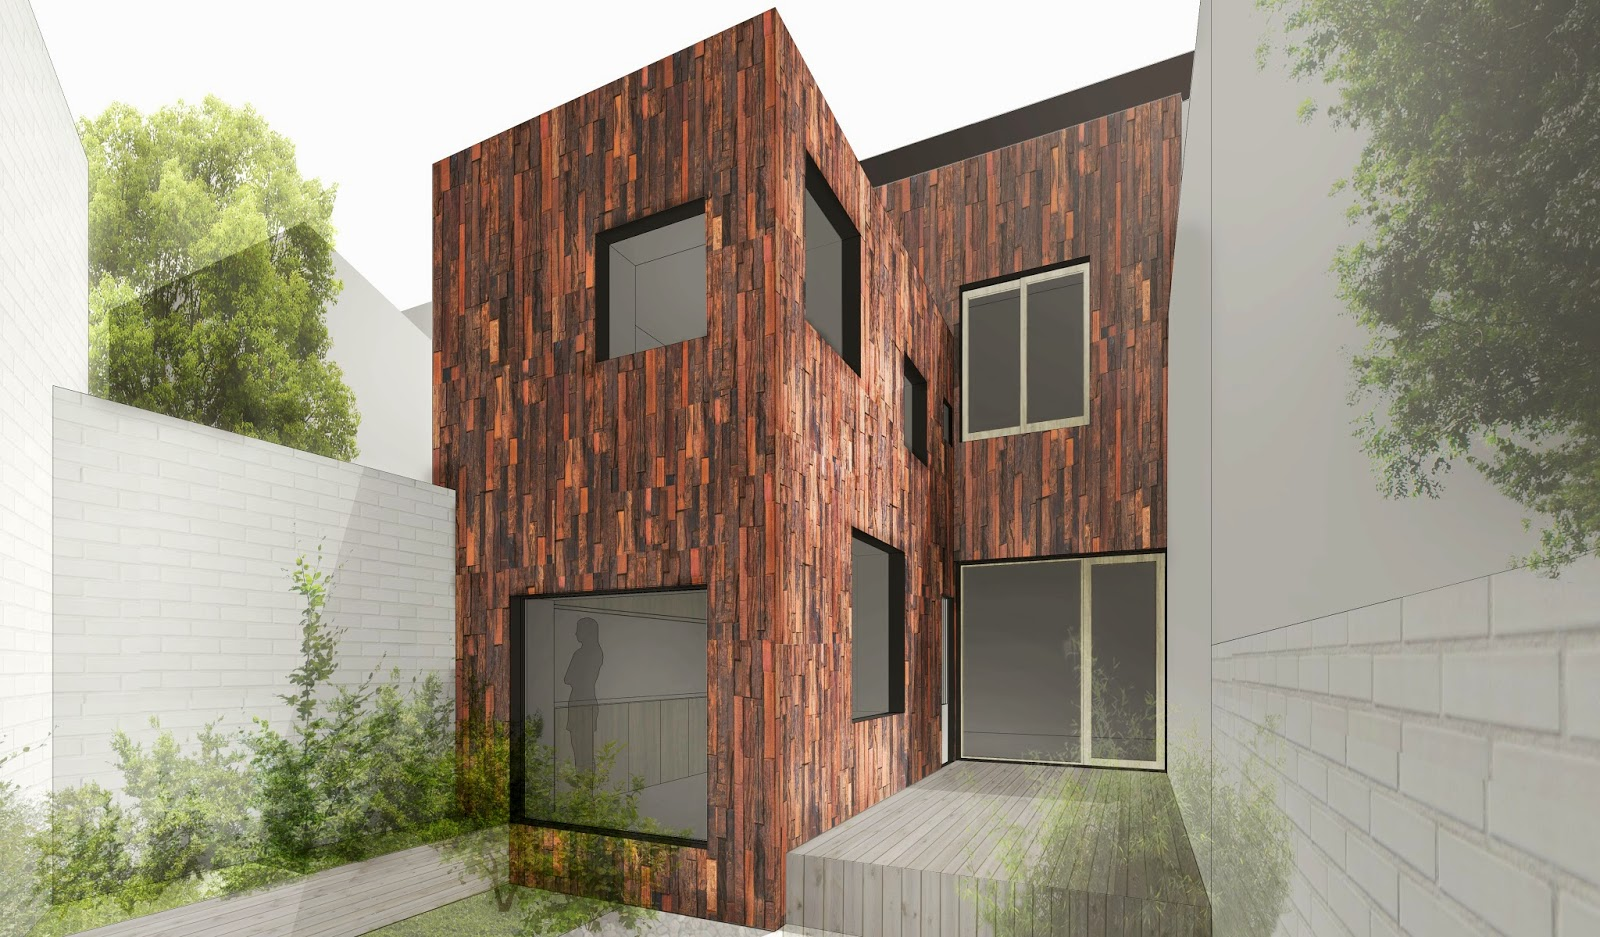 andres gonzalez gil fachada materiales reciclados recycled materials facade